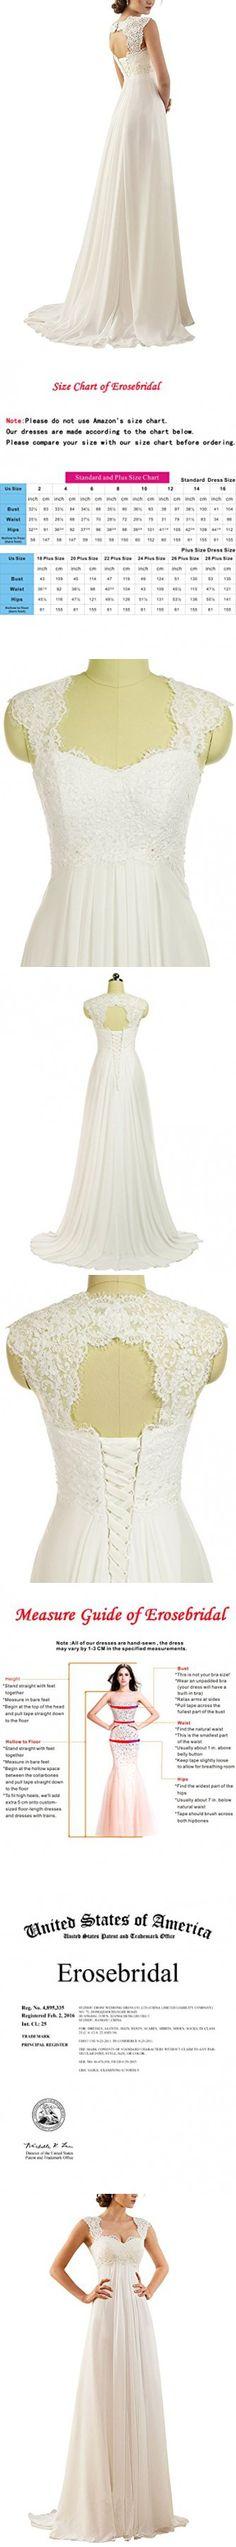 Erosebridal 2017 Women's Plus Size Wedding Dress for Beach Bridal Gown Size 22w Ivory